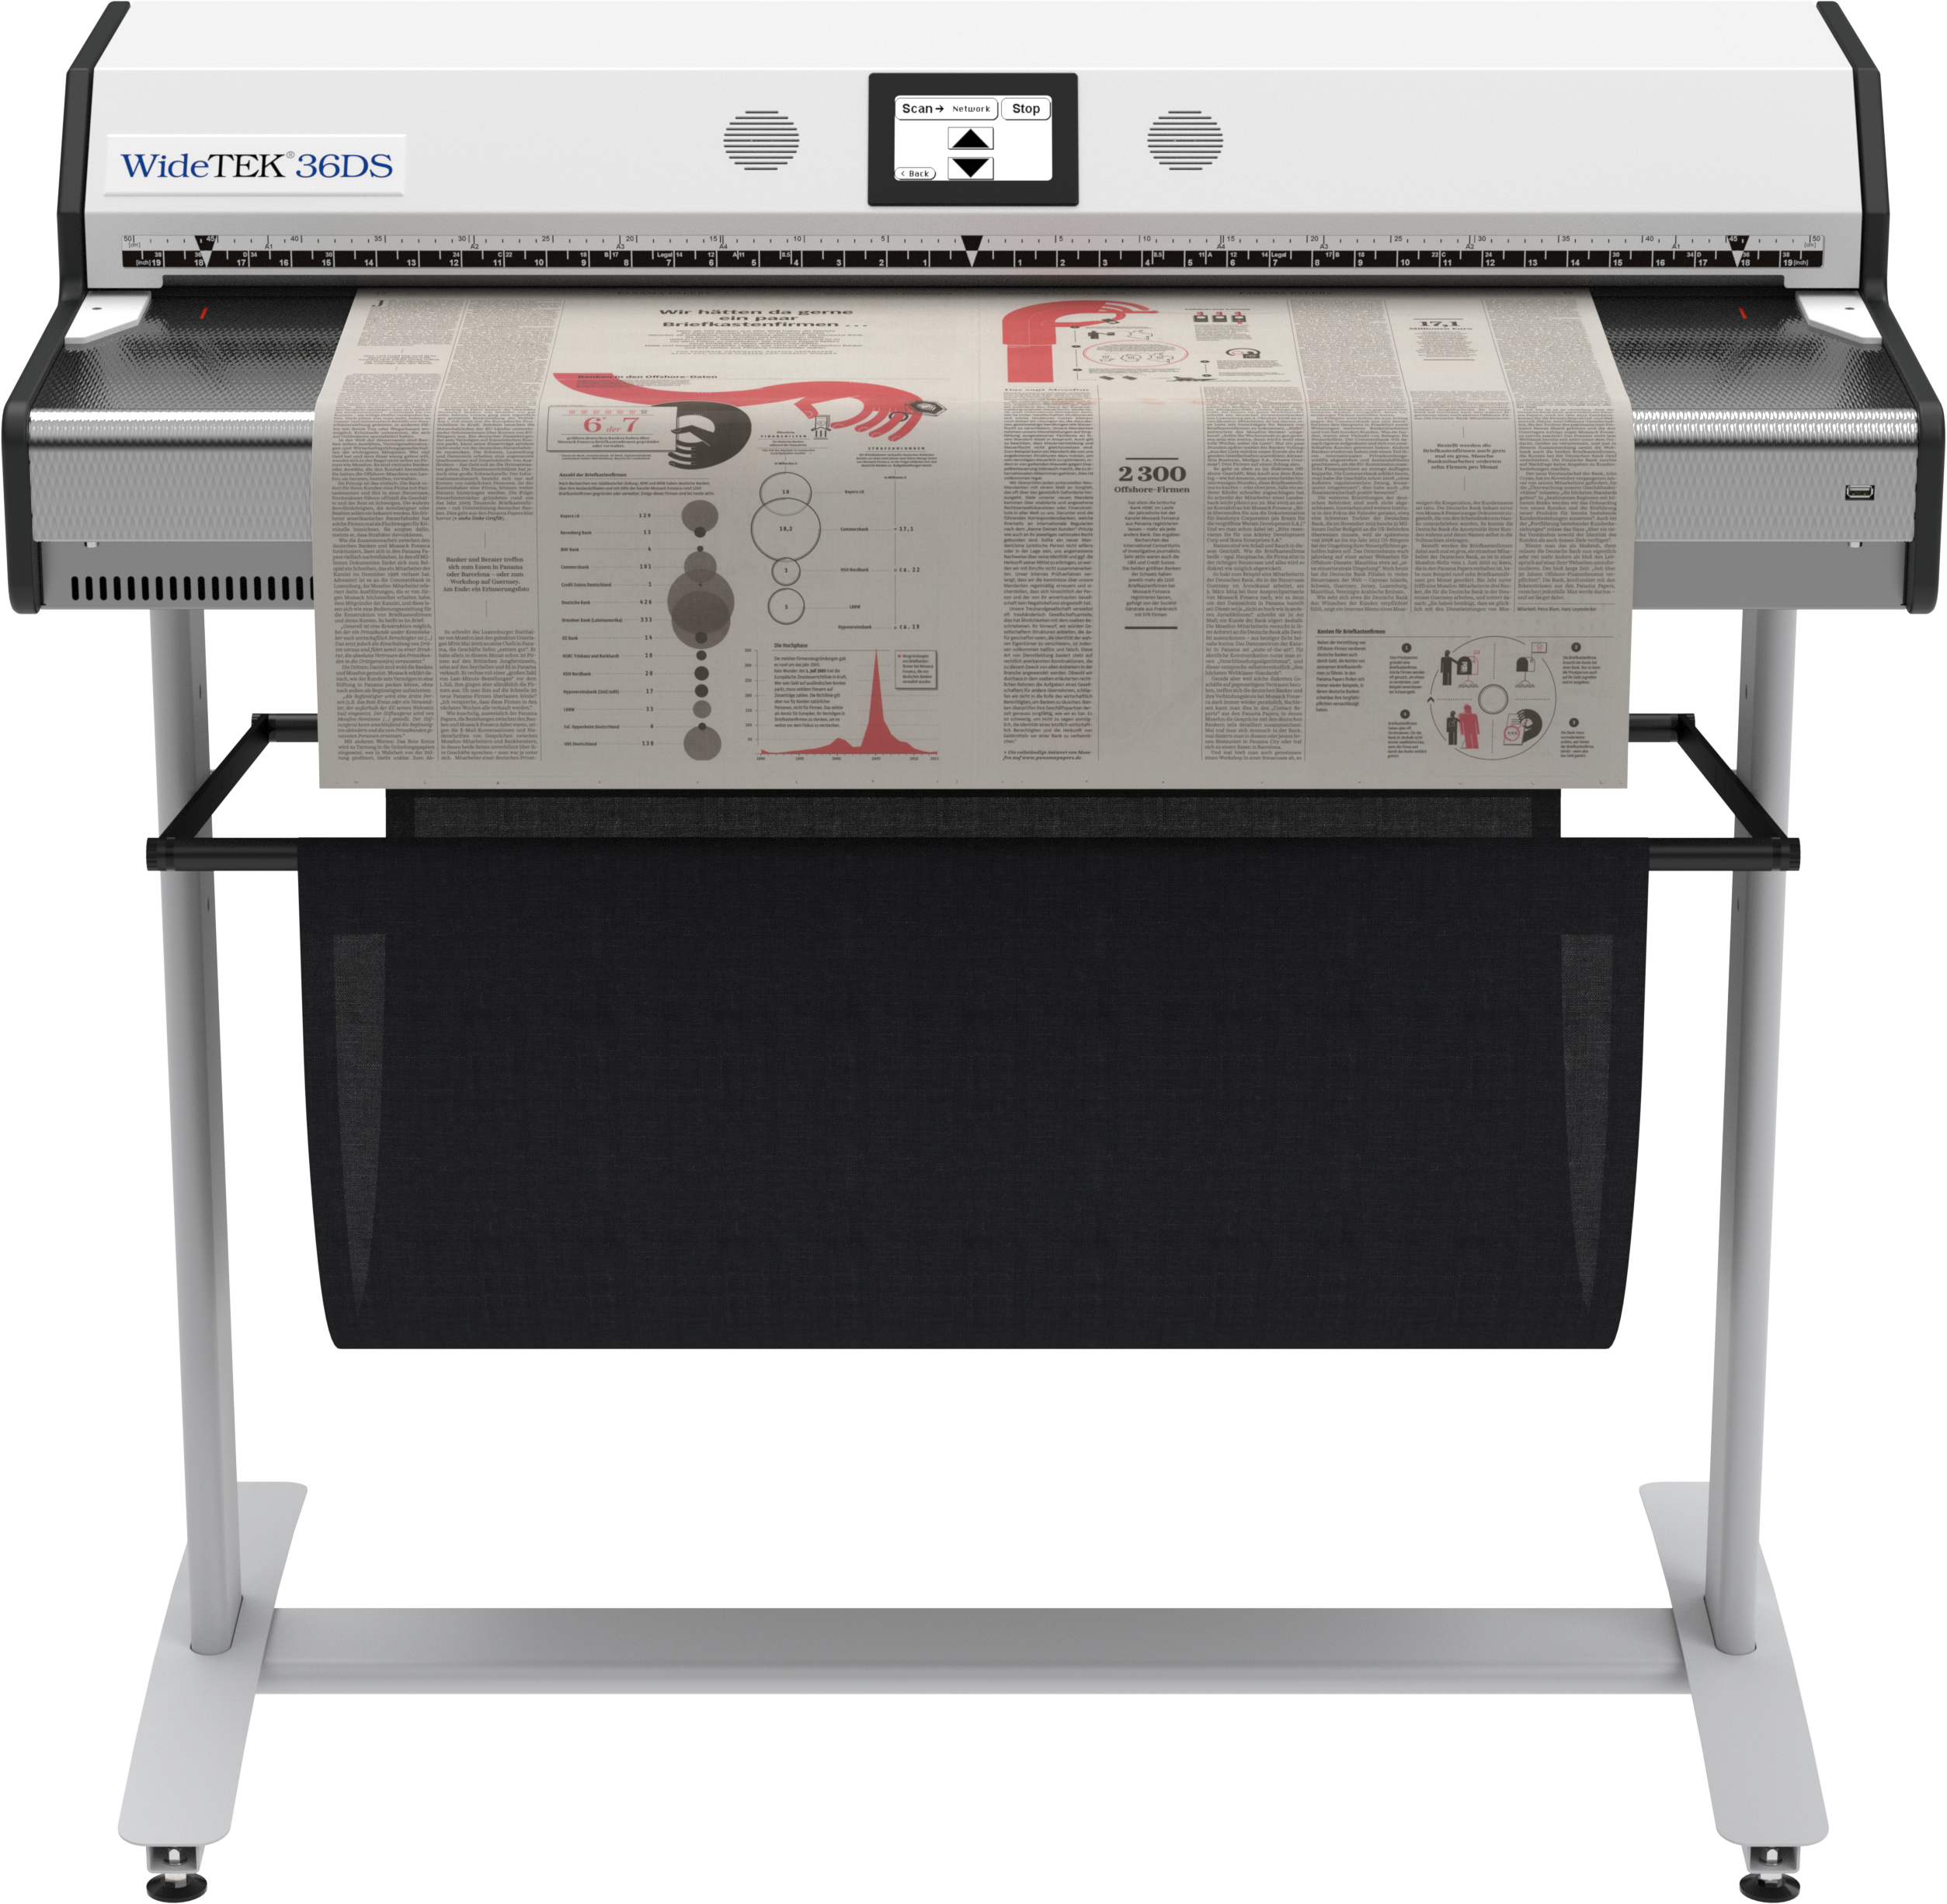 WideTEK 36DS-600 - Wide Format Scanner - Wide Format Scanners